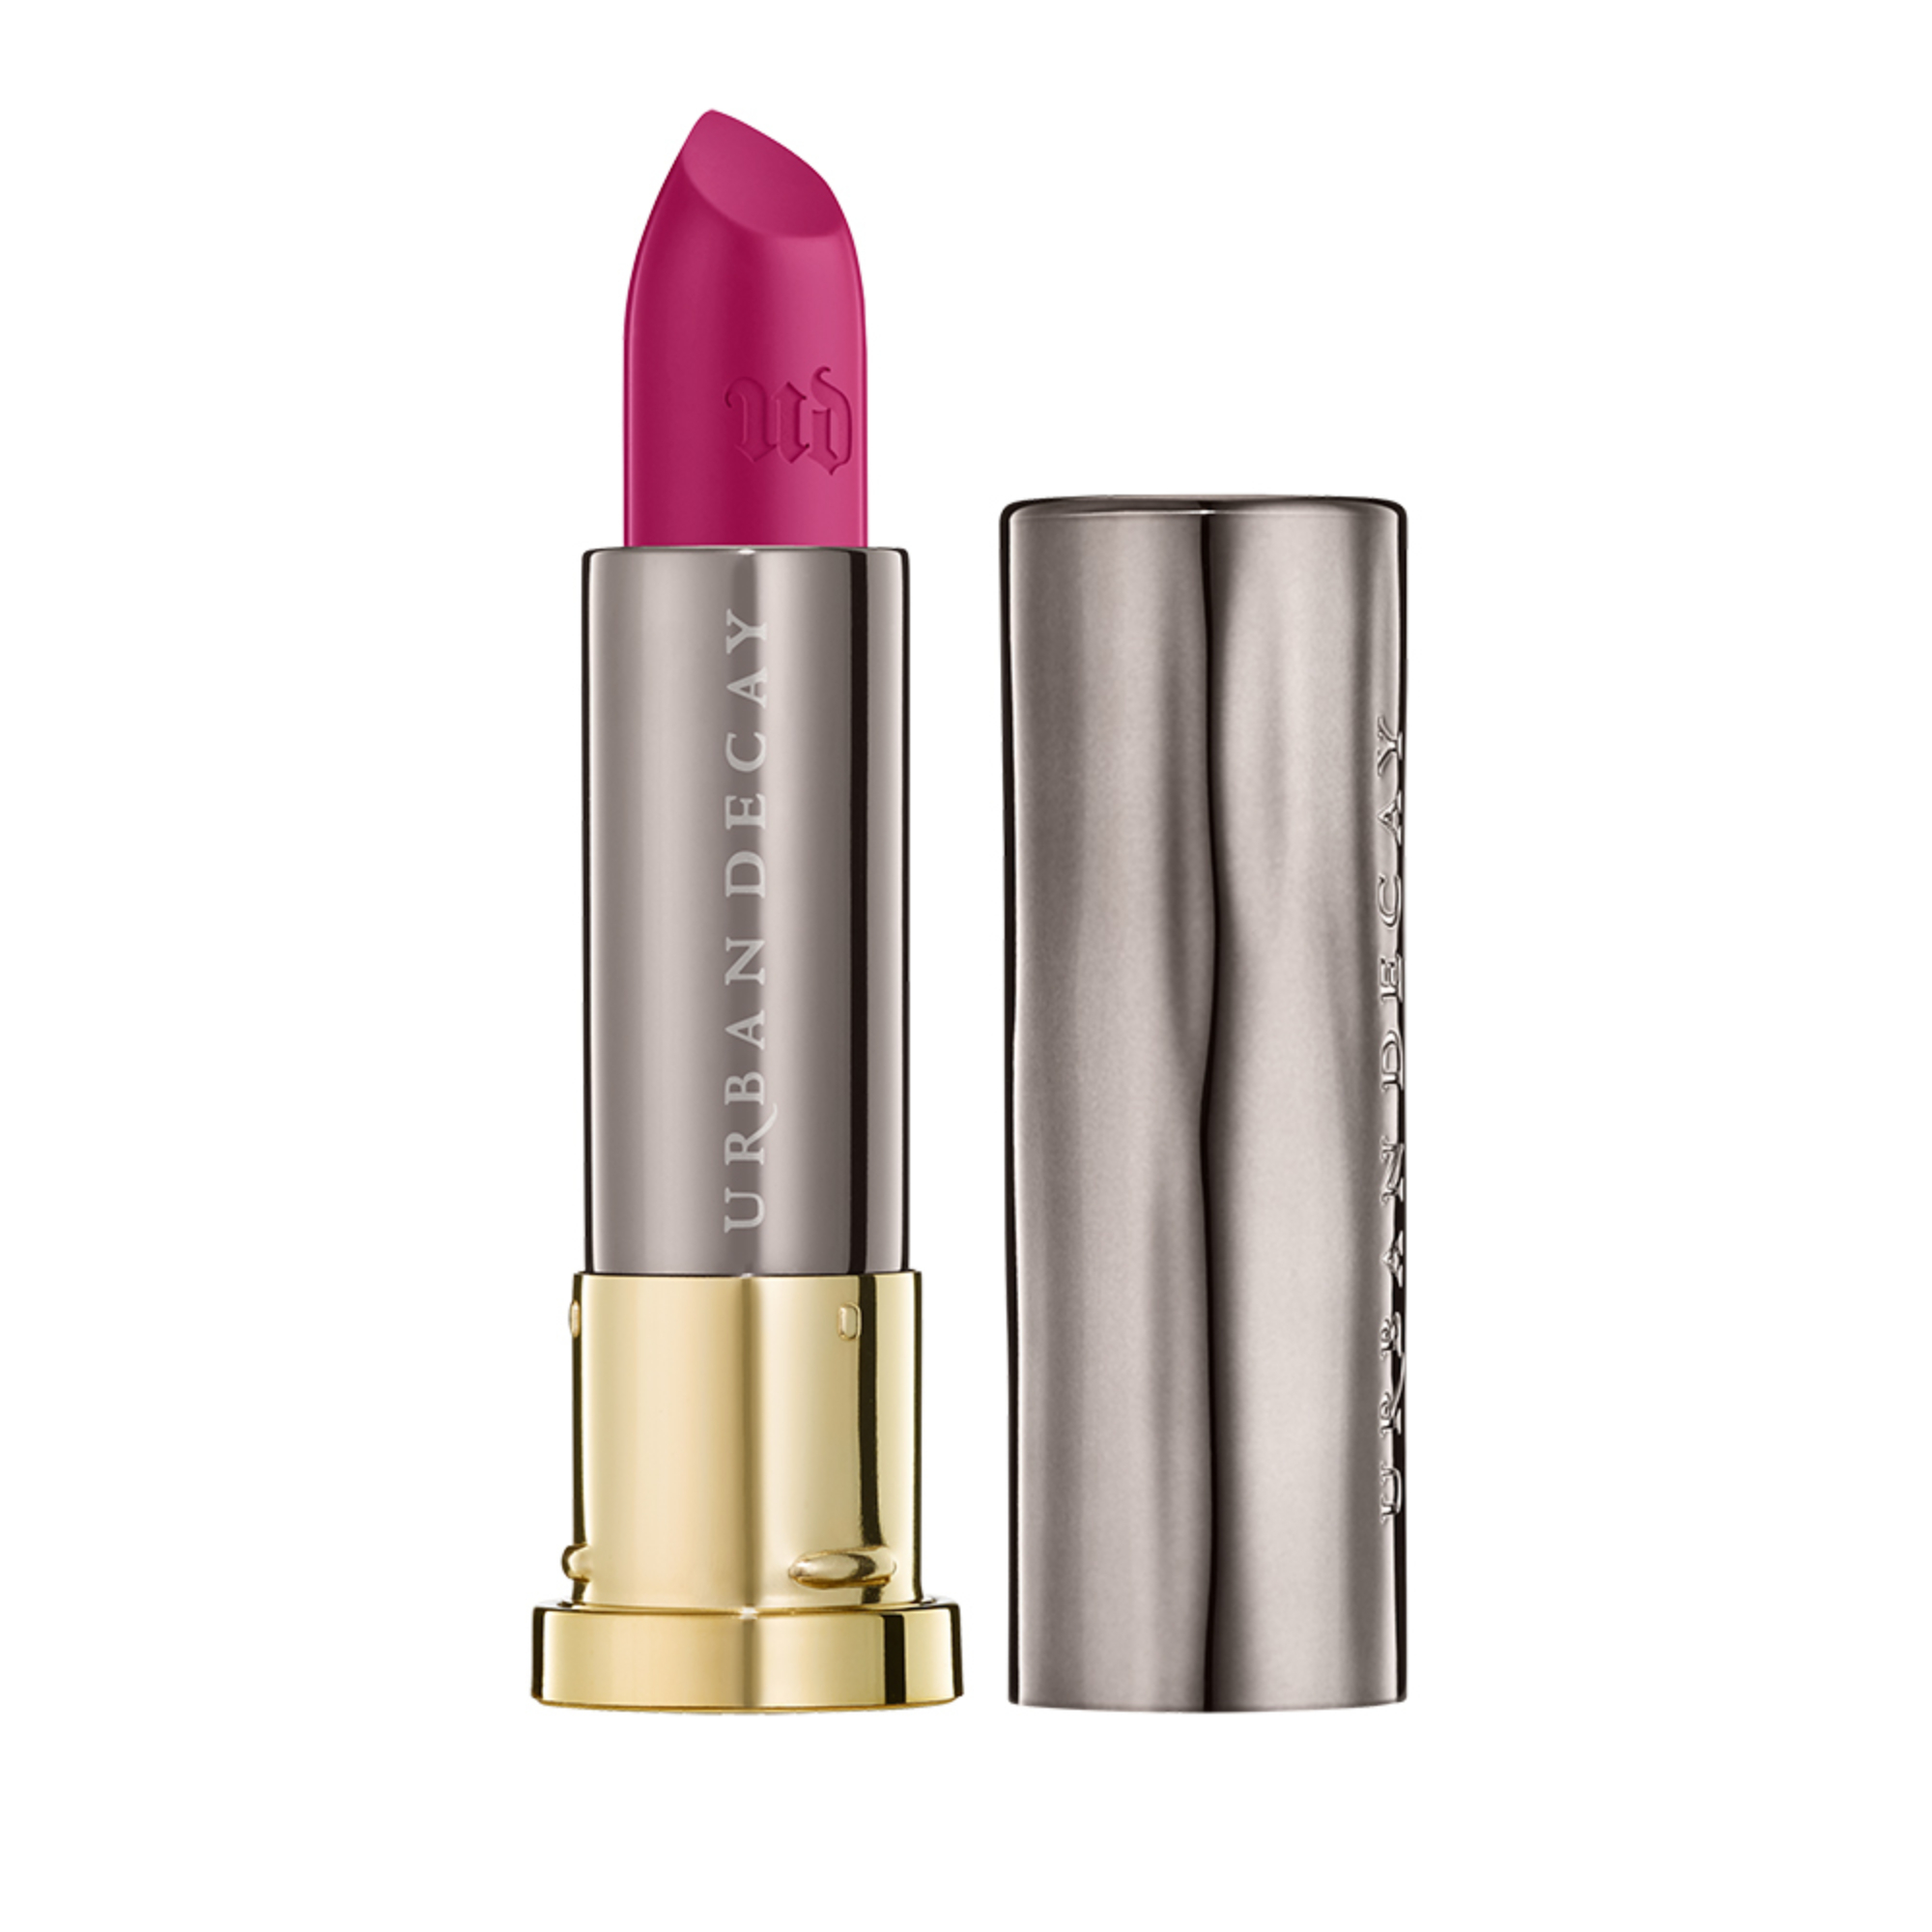 Urban Decay Comfort Matte Vice Lipstick, menace